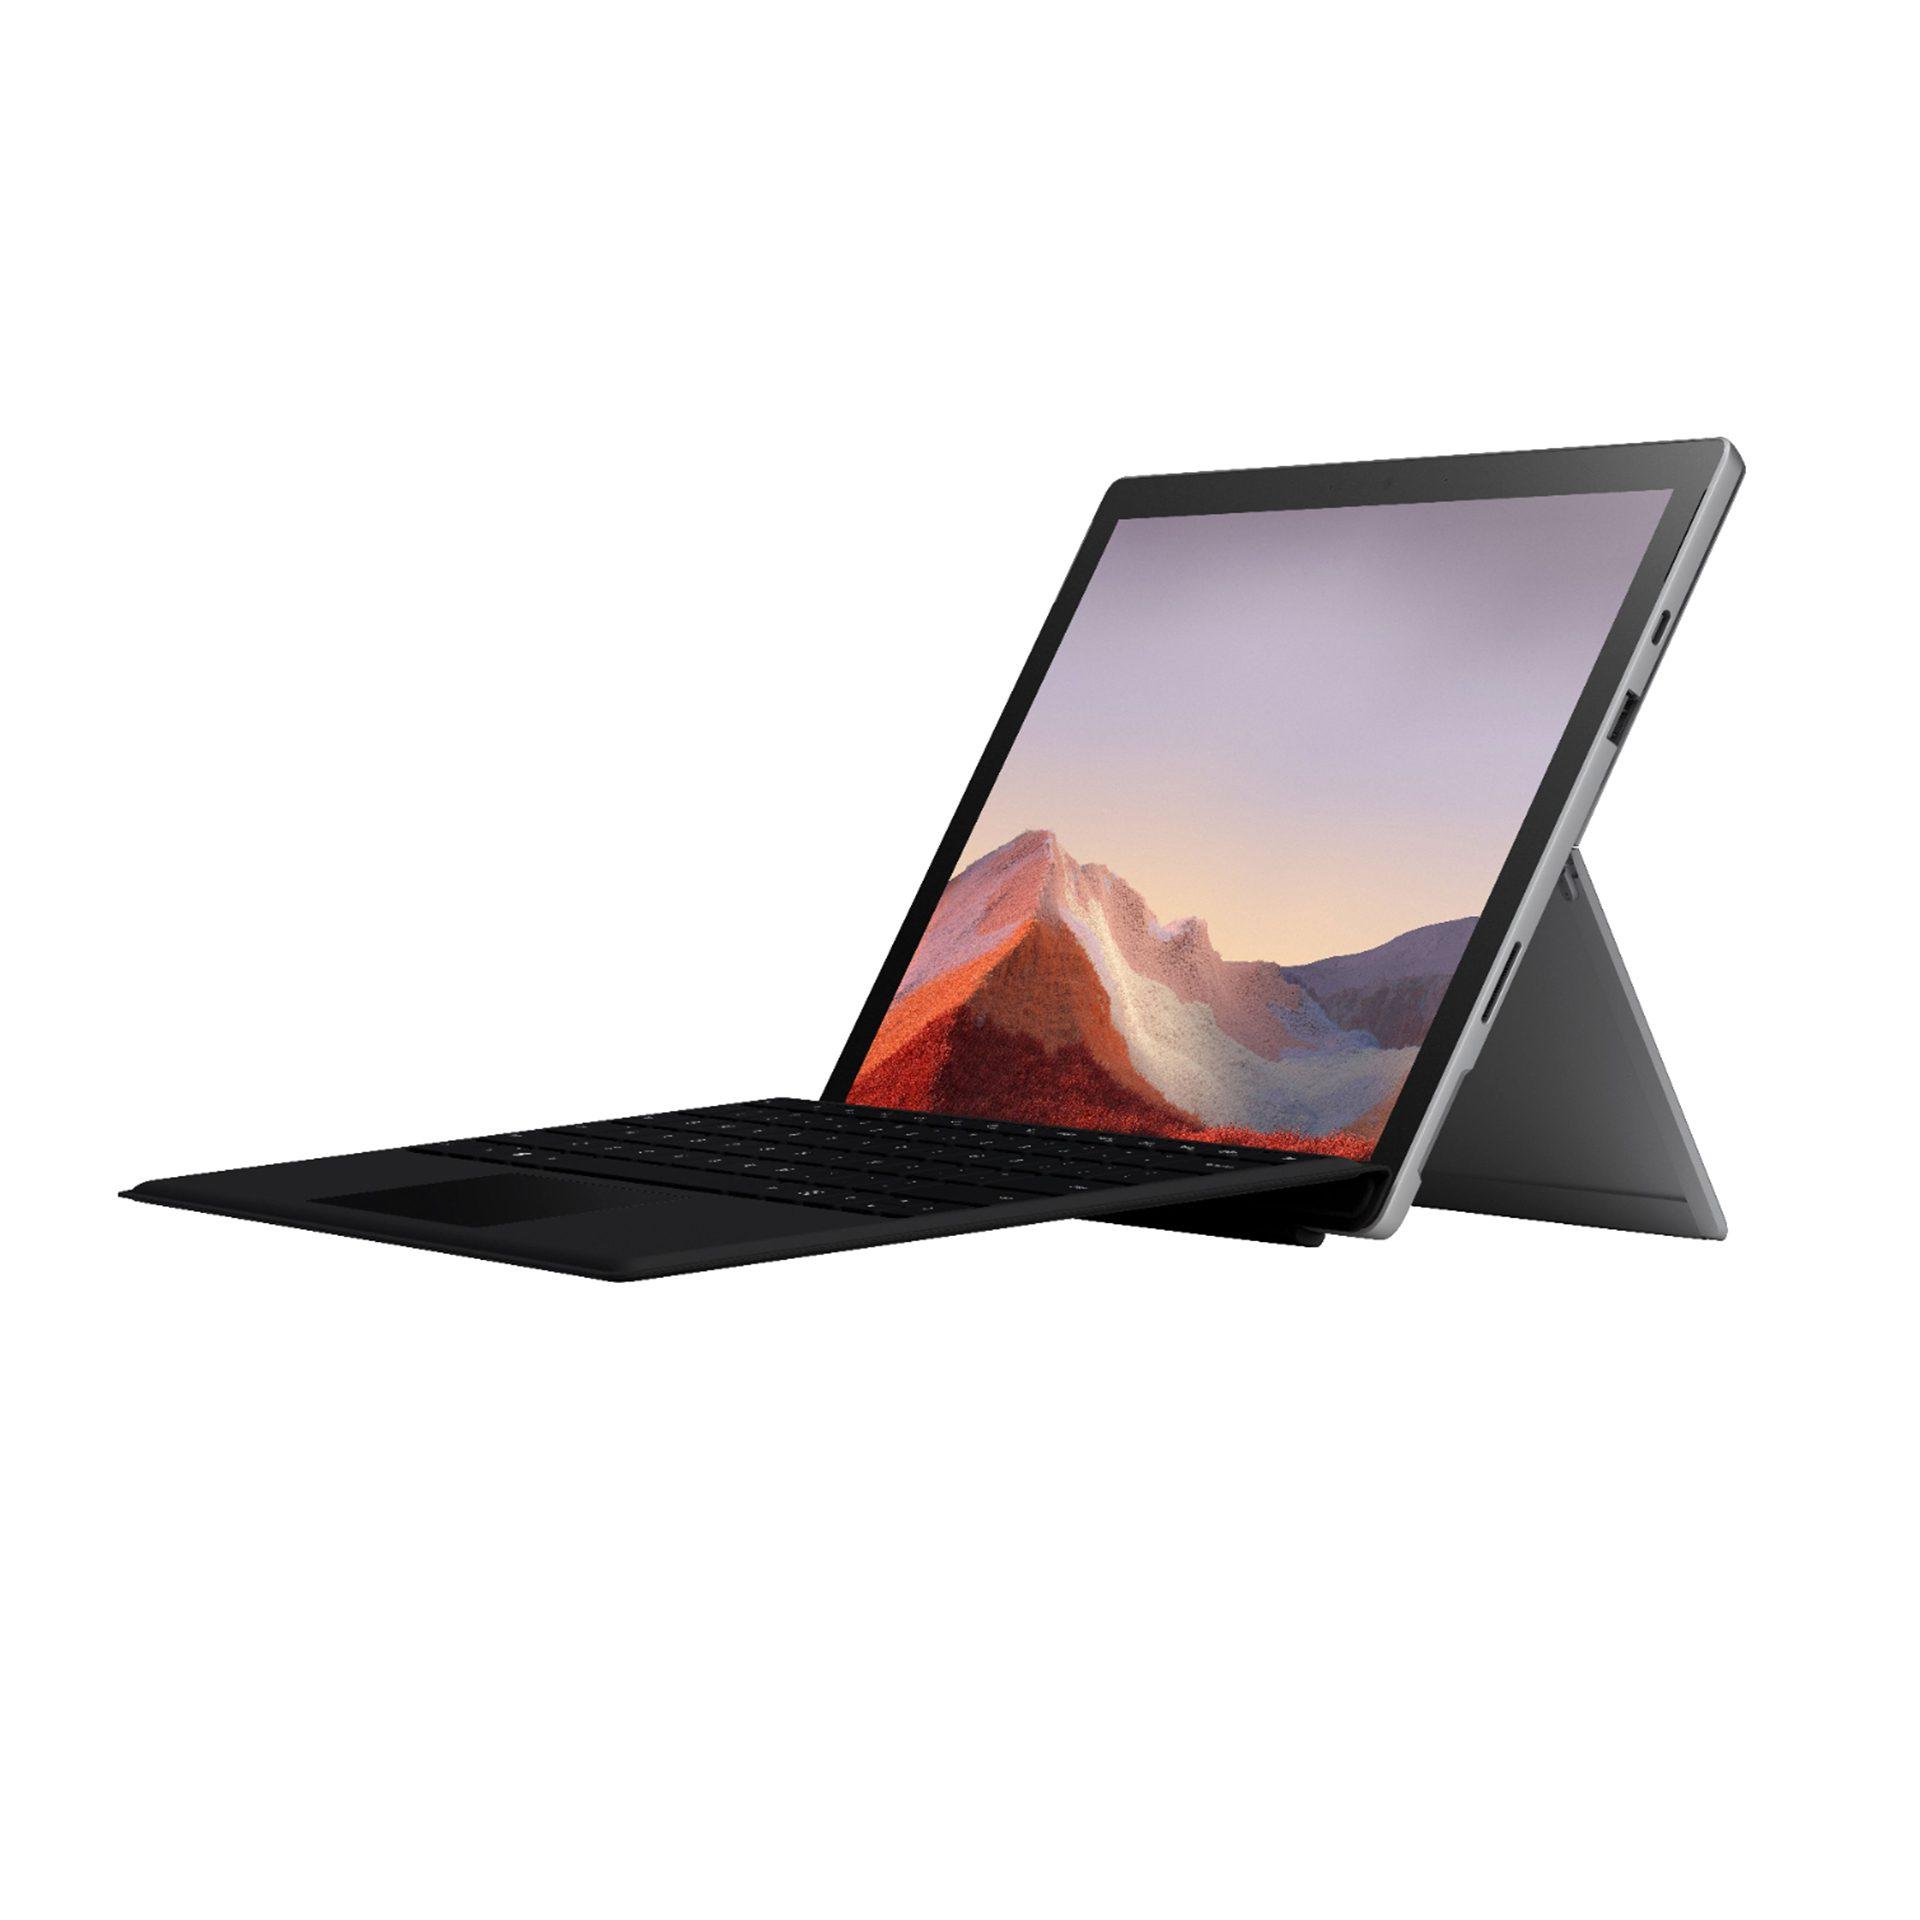 Surface Pro 7 Core I5 / 16GB / 256GB